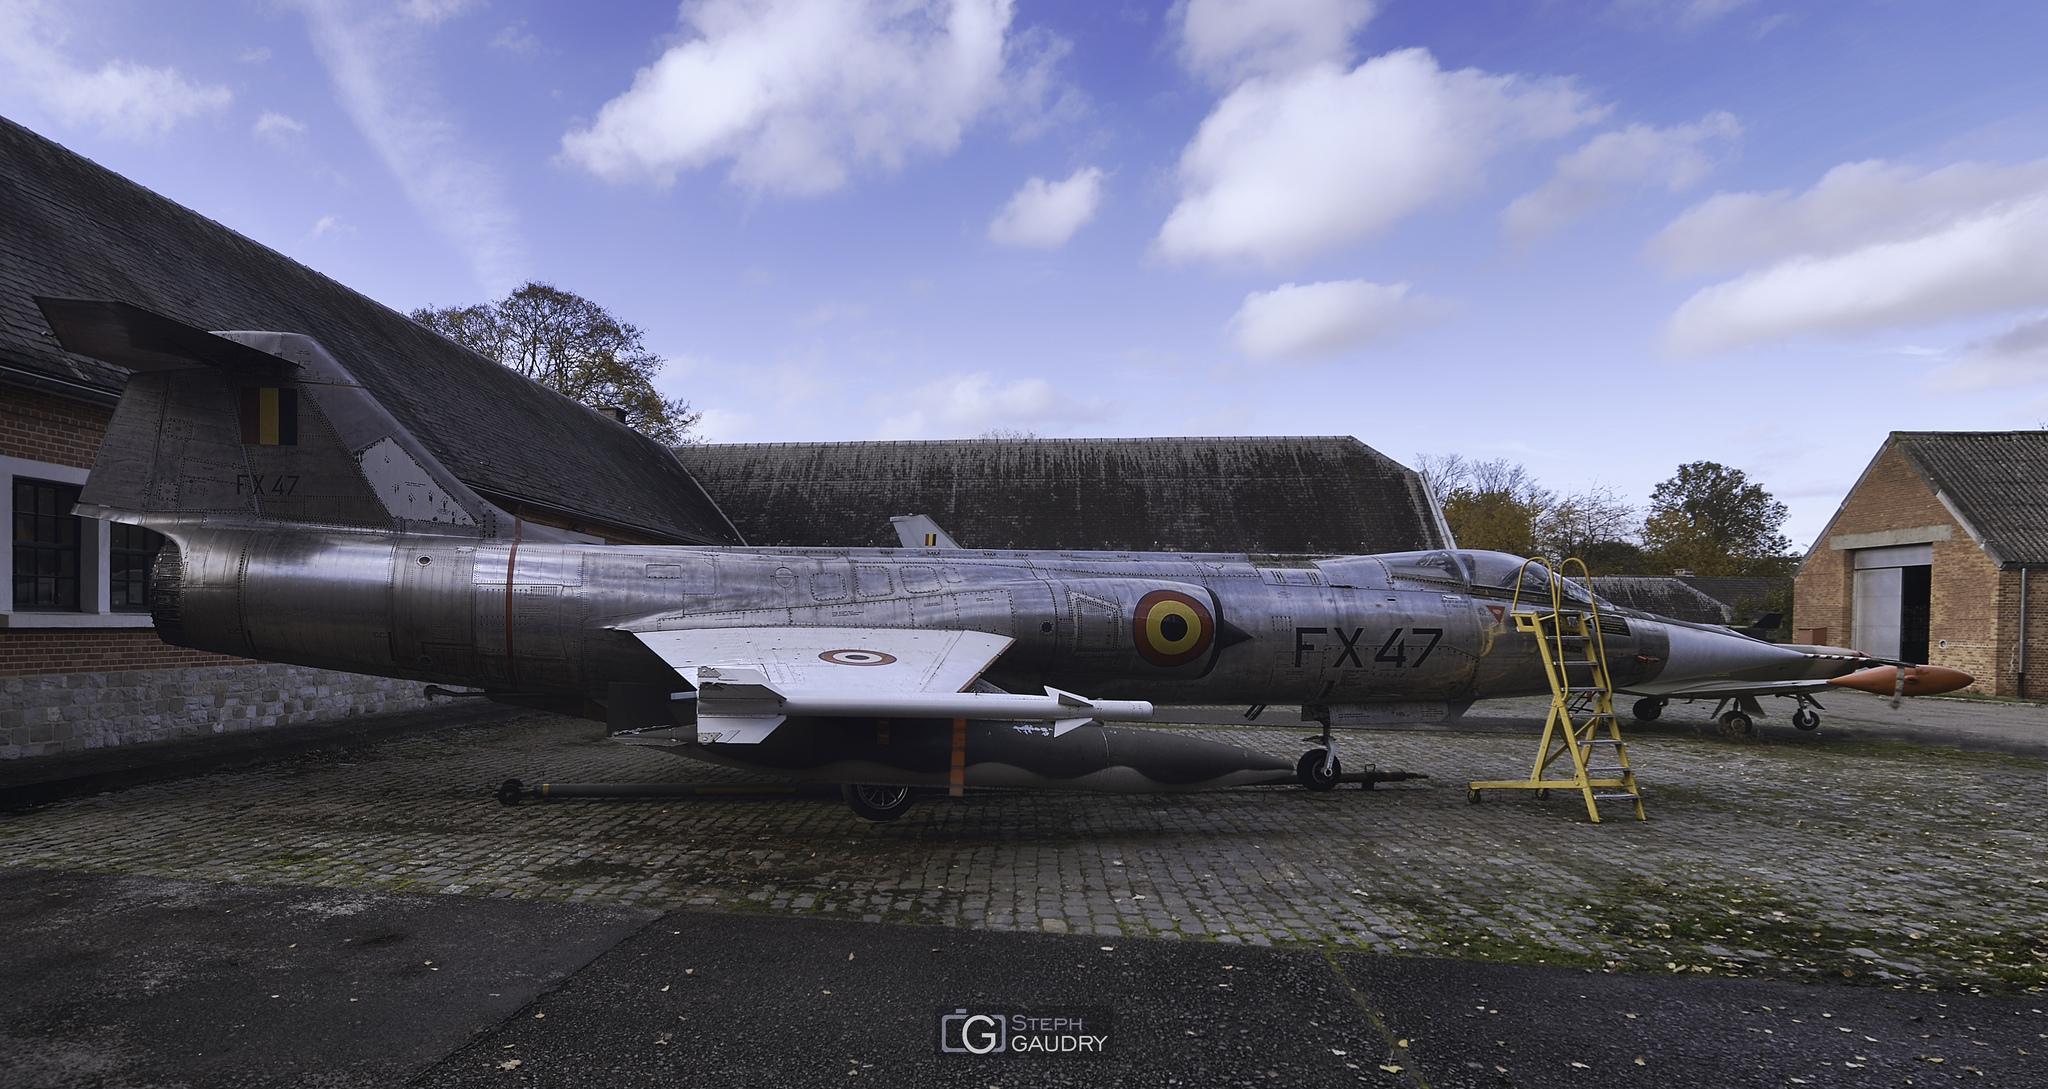 Lockheed F-104G Starfighter [Cliquez pour lancer le diaporama]